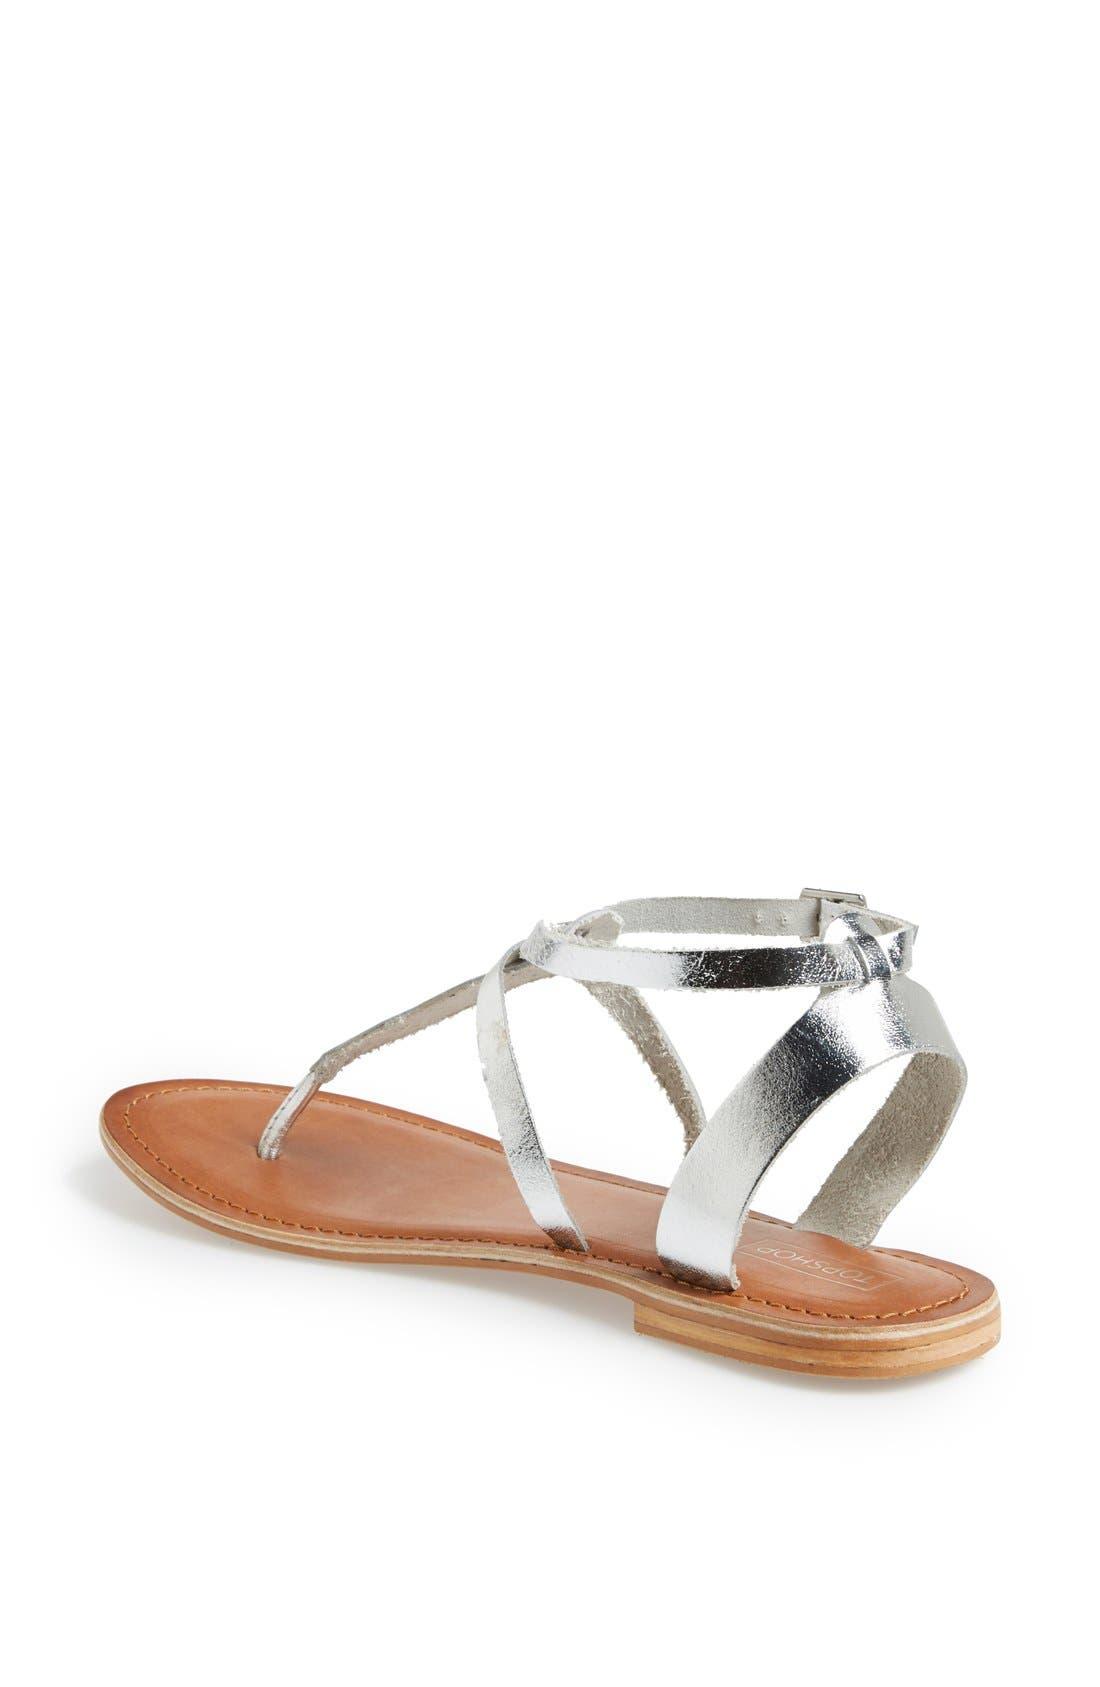 Alternate Image 2  - Topshop 'Horizon' Leather Sandal